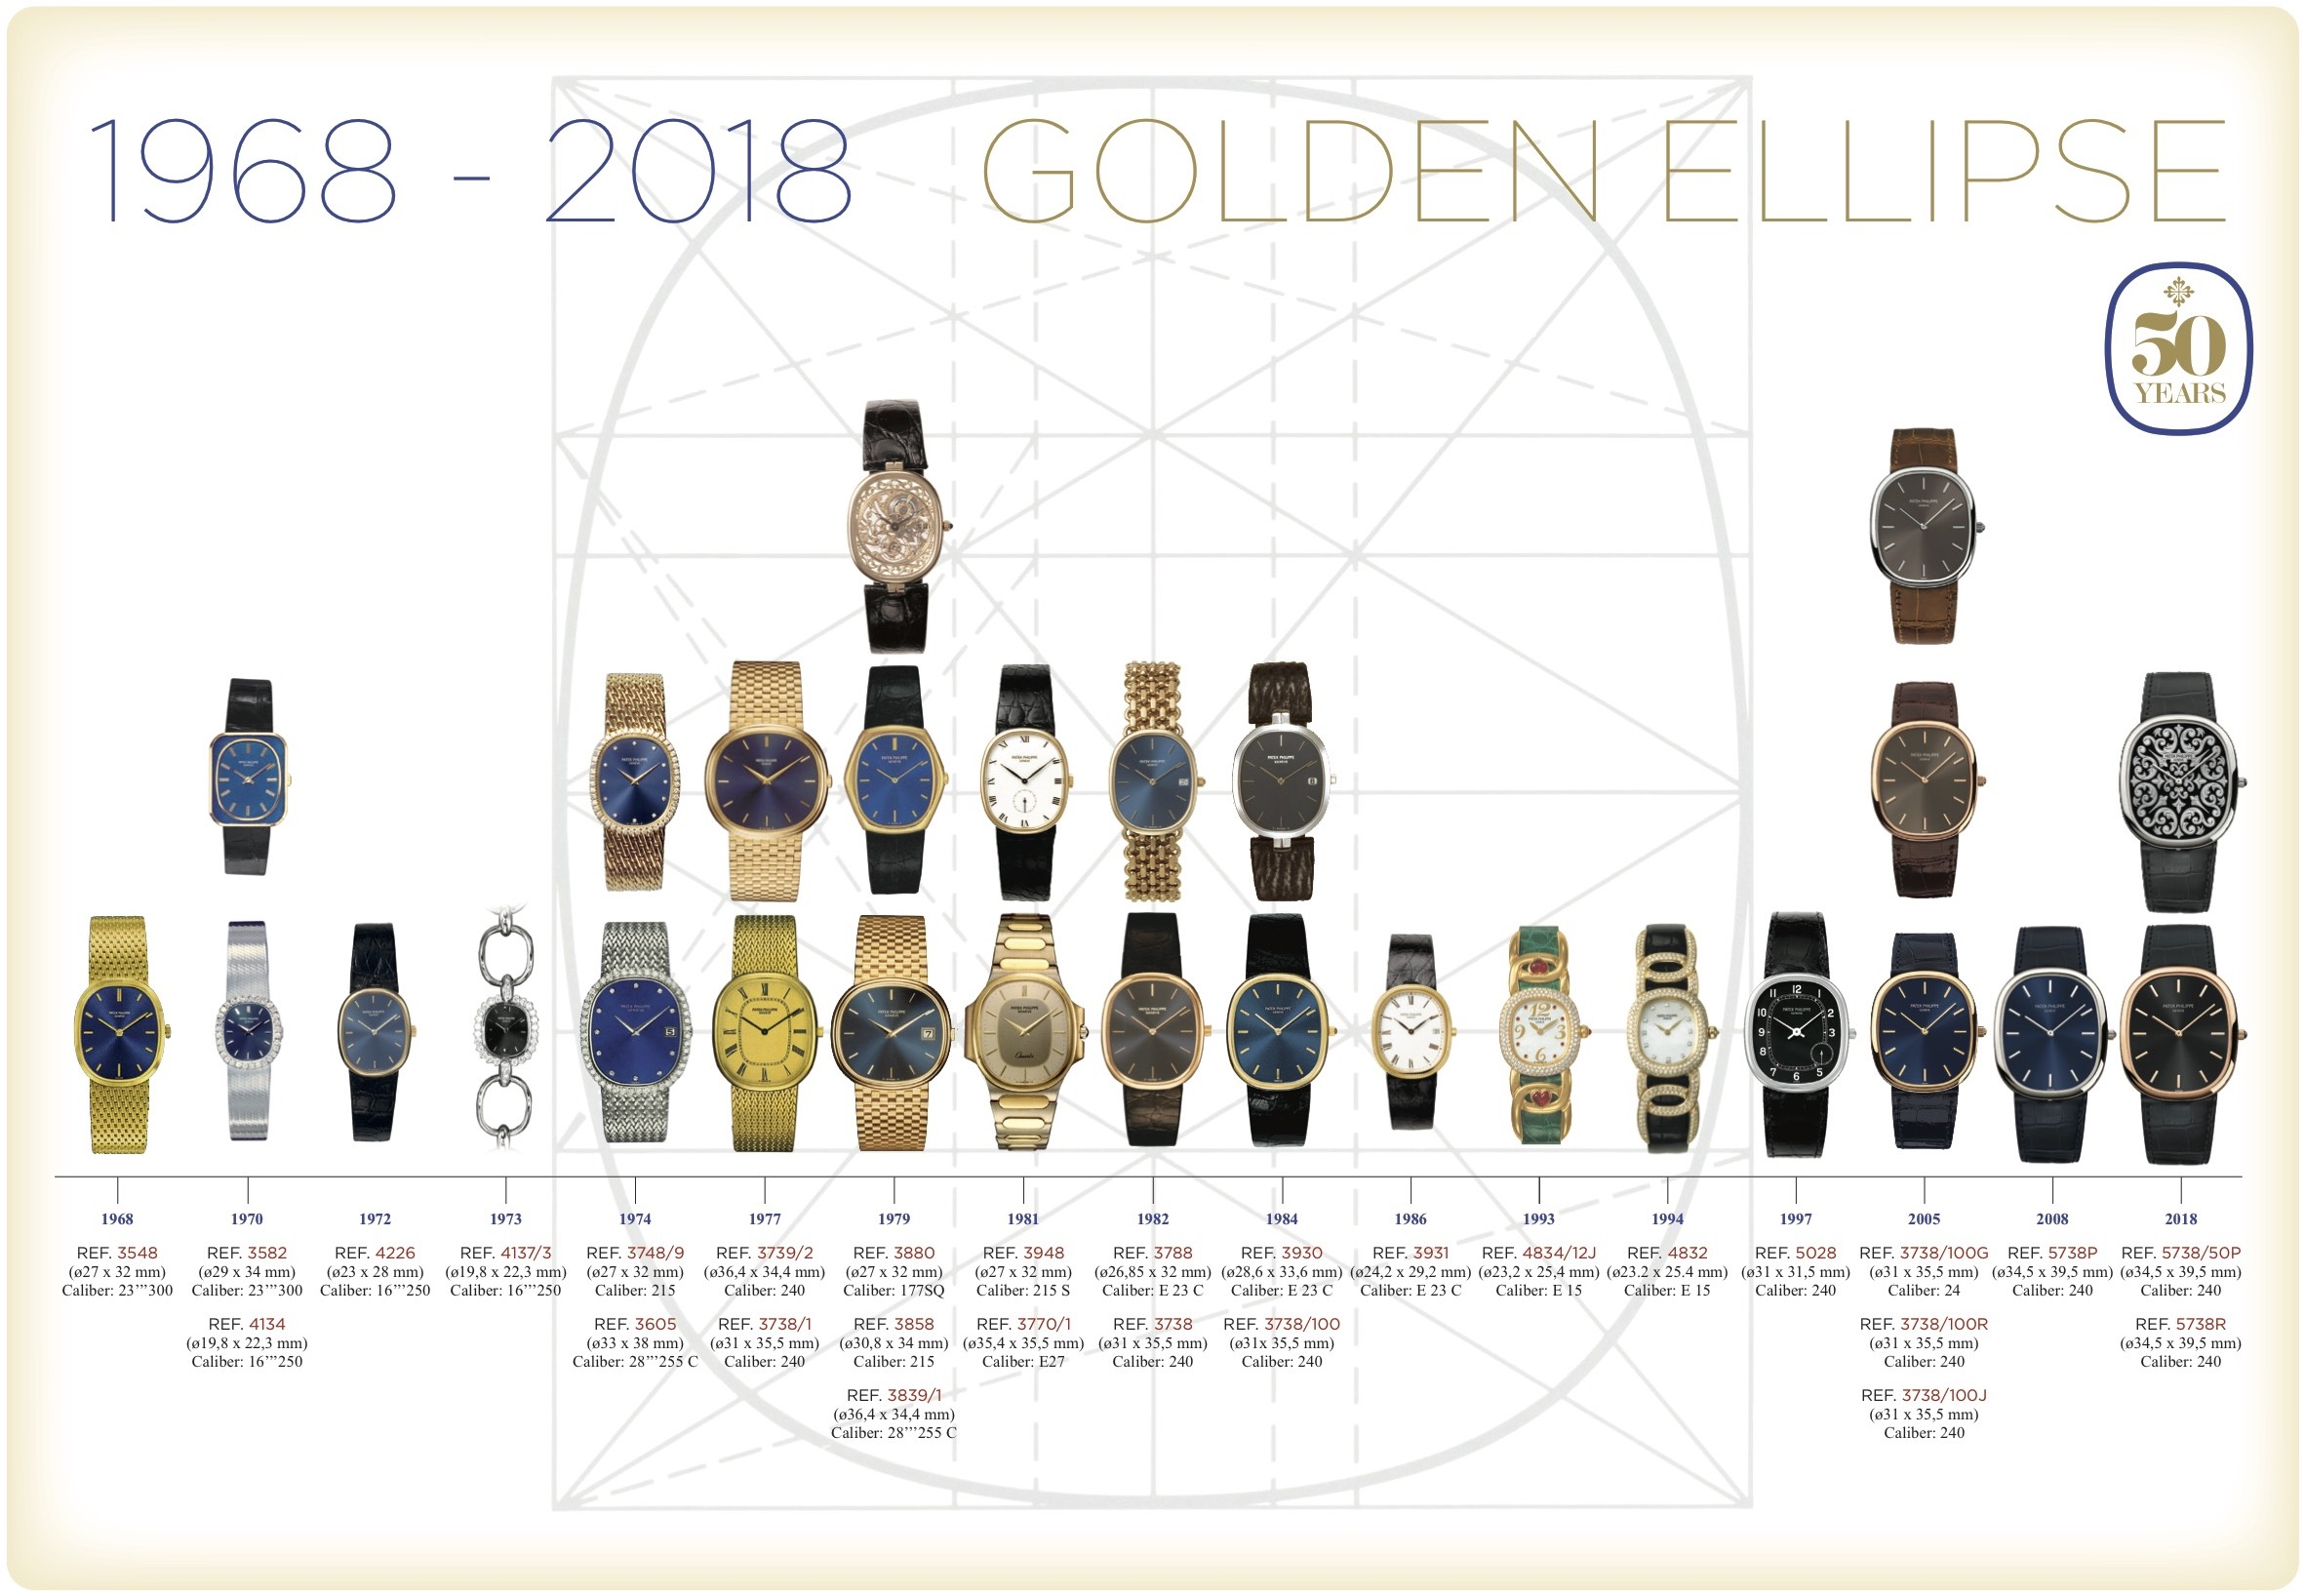 Patek Philippe TimeLine Golden Ellipse 1968-2018 50 years